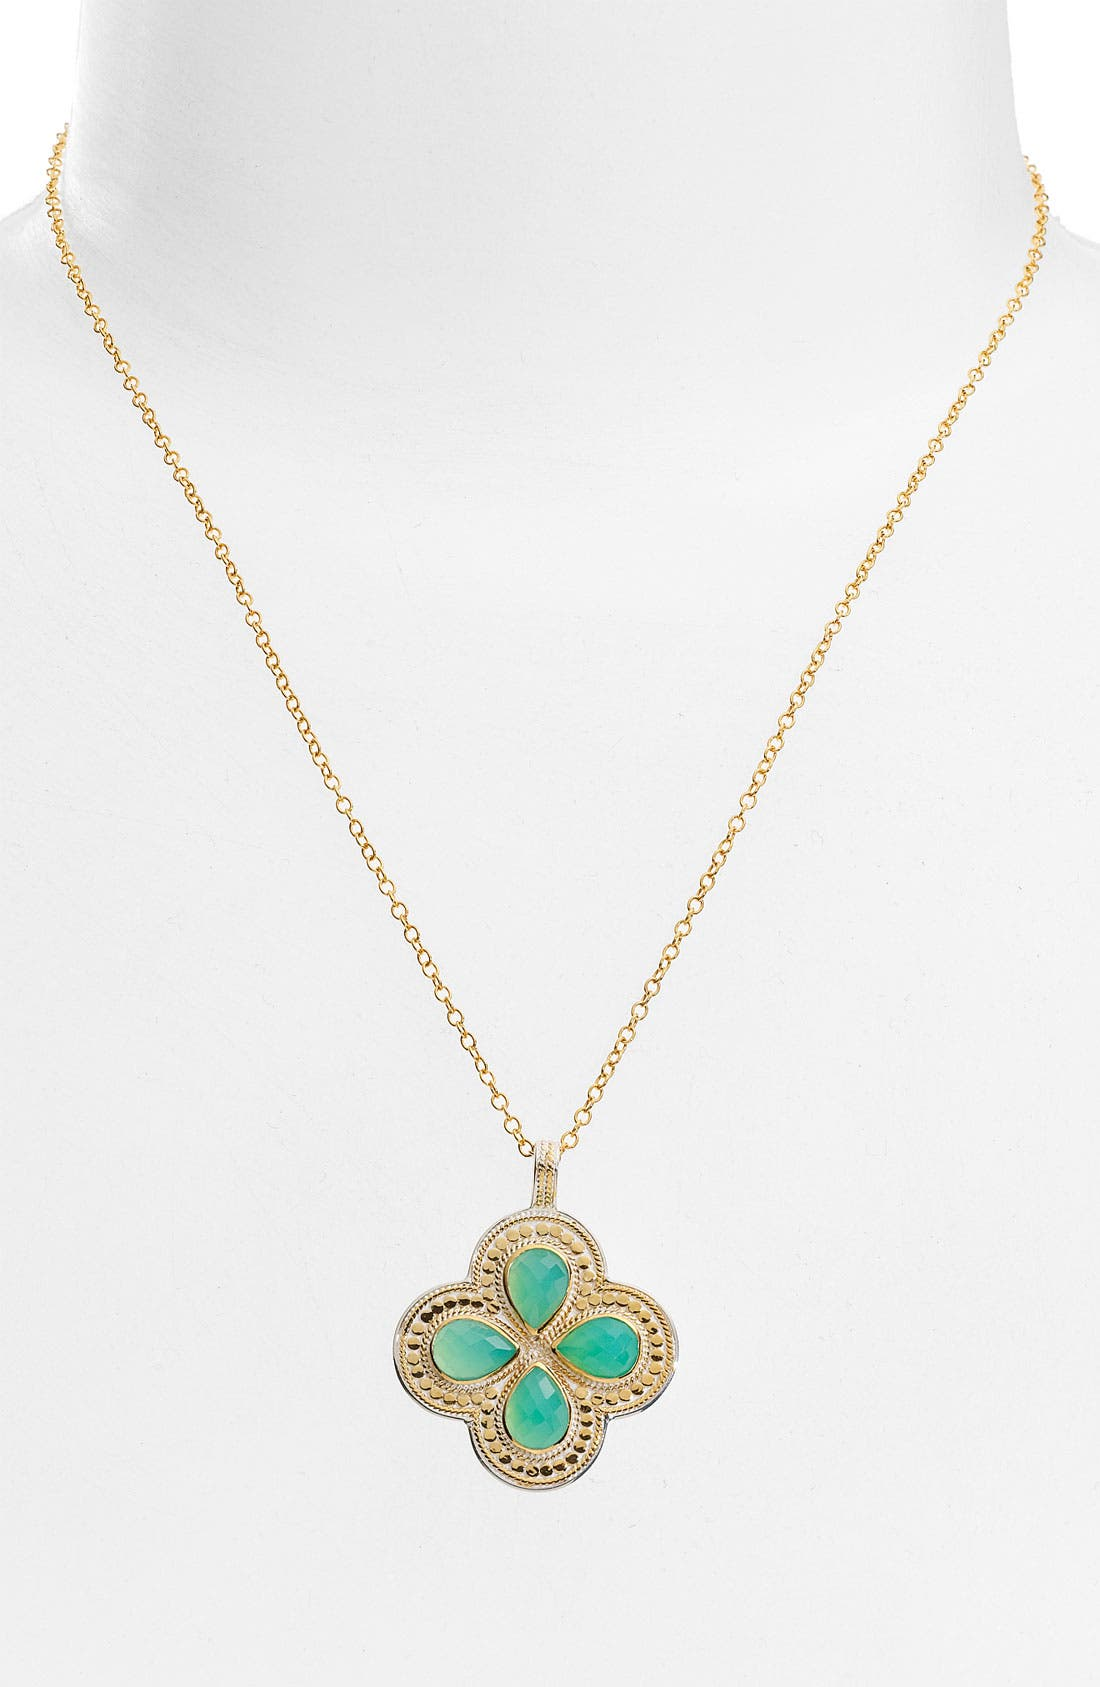 ANNA BECK 'Gili' Small Clover Pendant Necklace, Main, color, 710